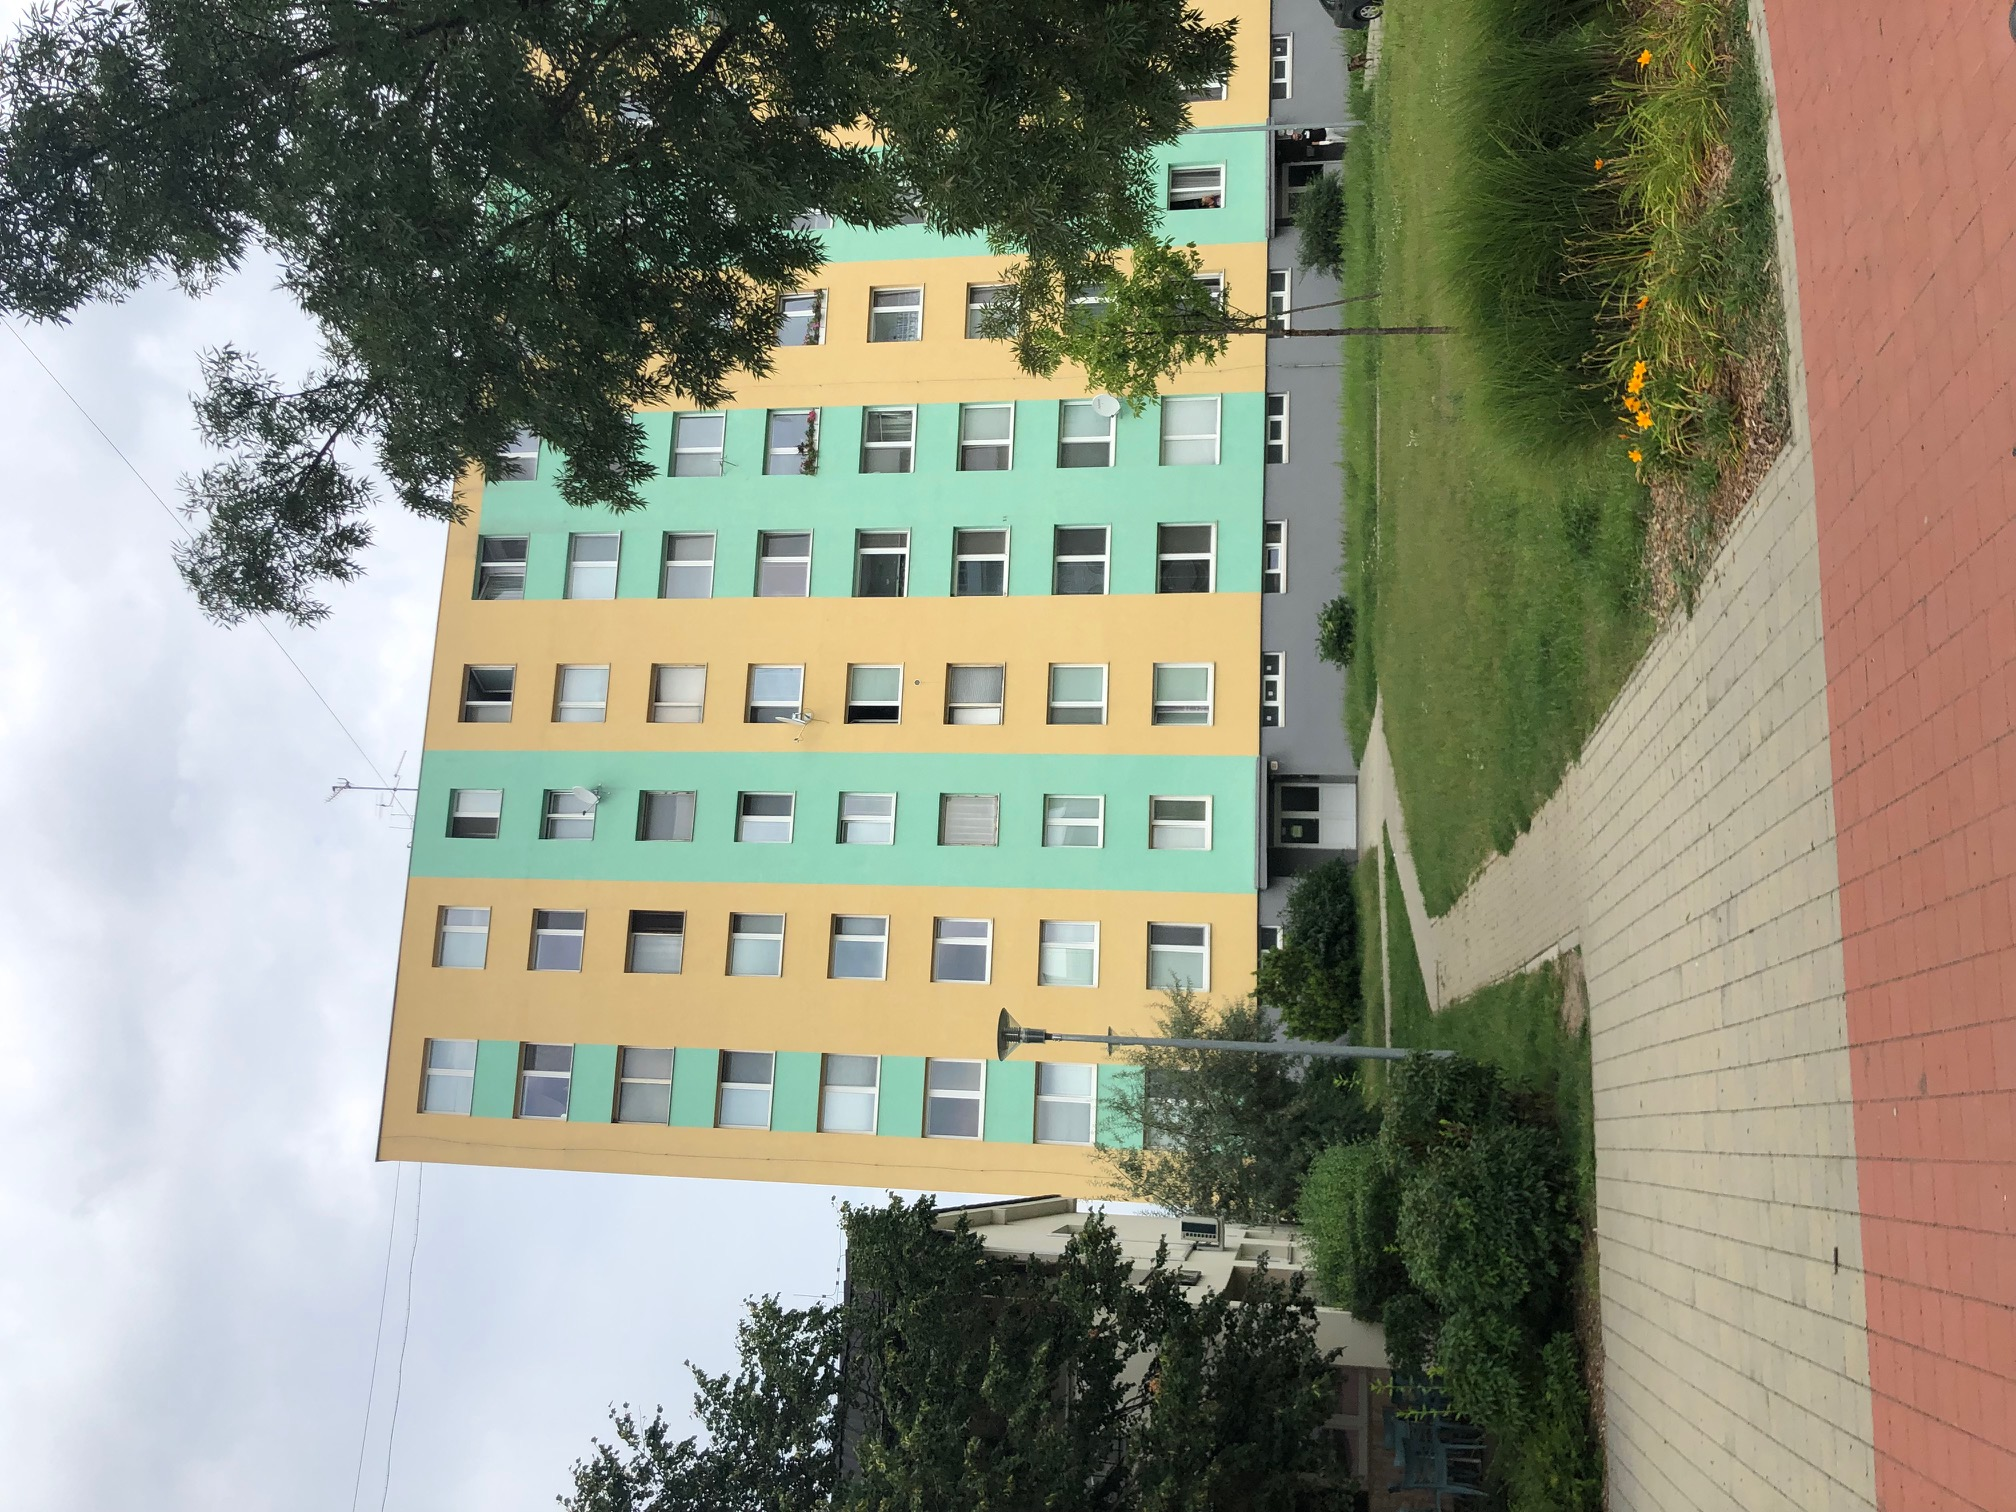 2 izbový byt, 52m2, pivnica, pôvodný stav, Skuteckého, Malacky Juh-28